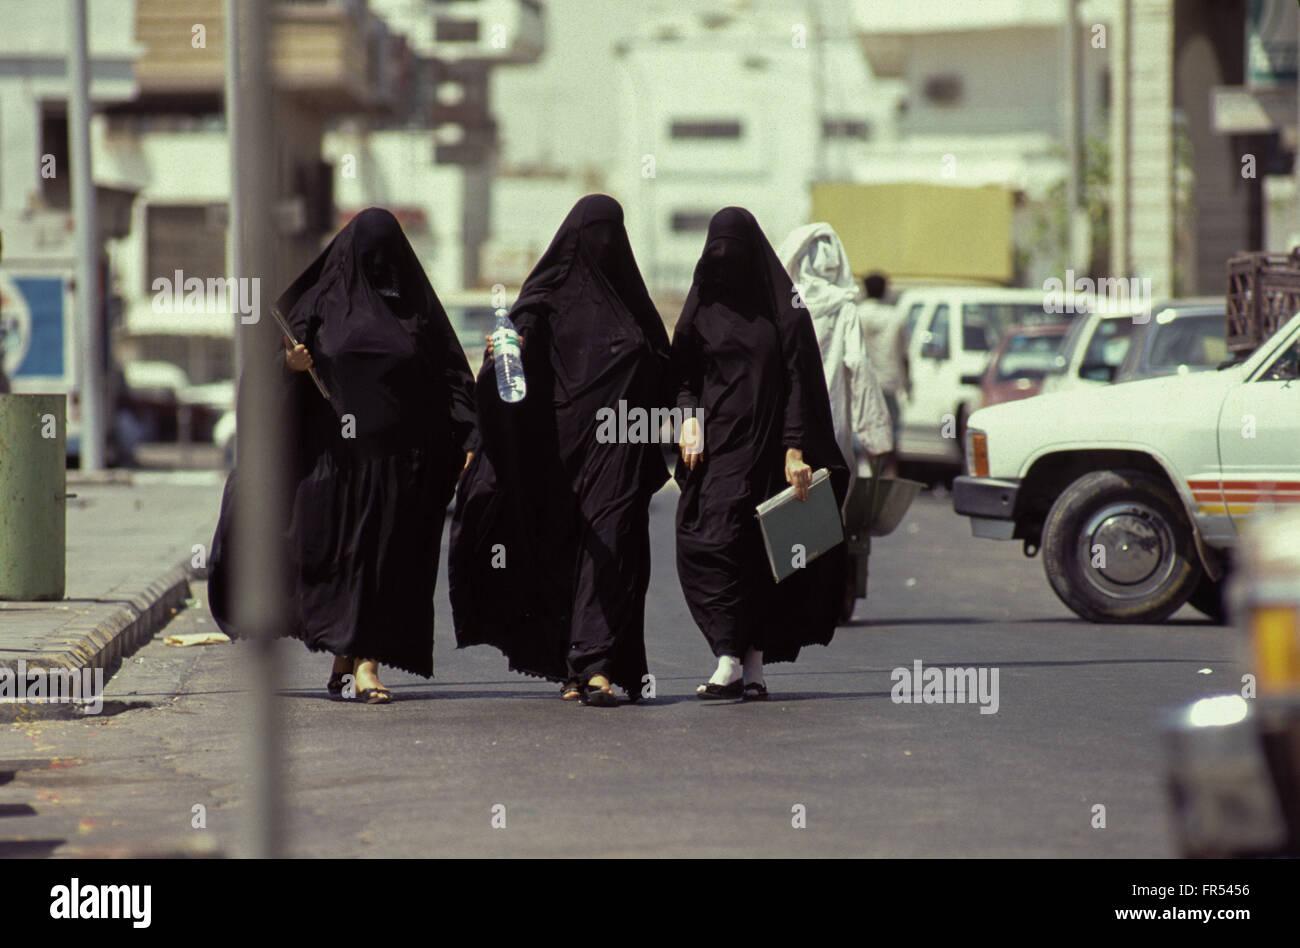 Stock photo three saudi veiled women walking in al khobar eastern province saudi arabia